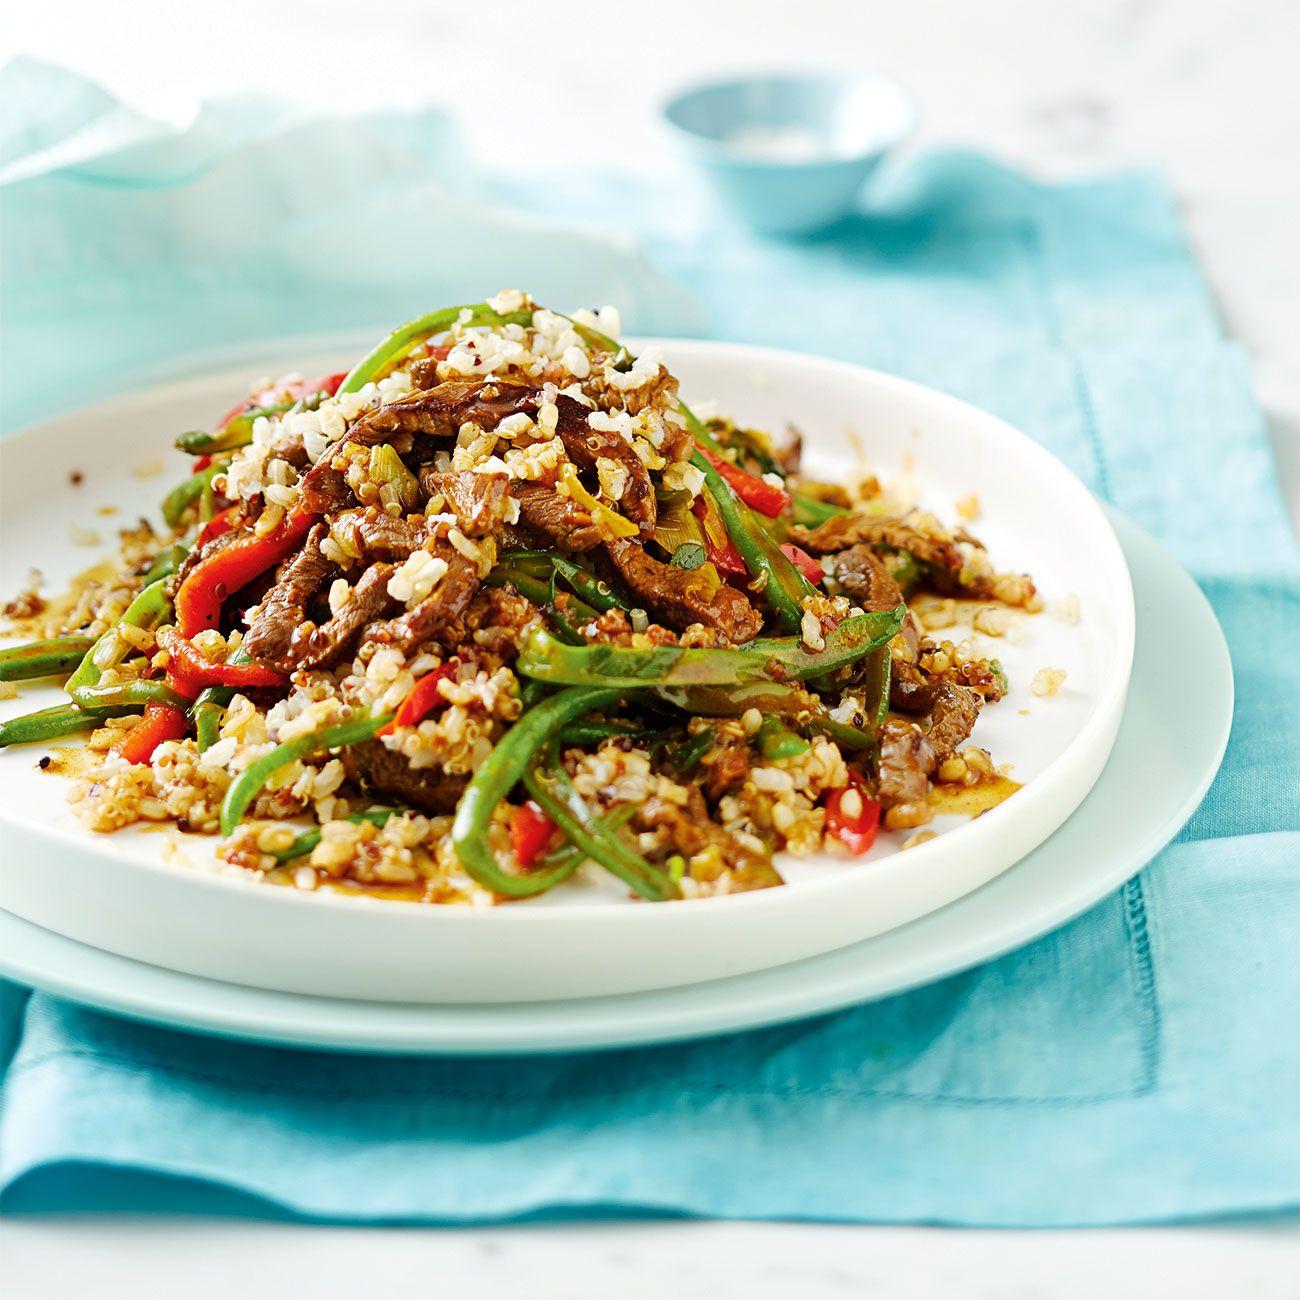 Stir Fried Beef Quinoa Recipes Food Magazine Food Dishes